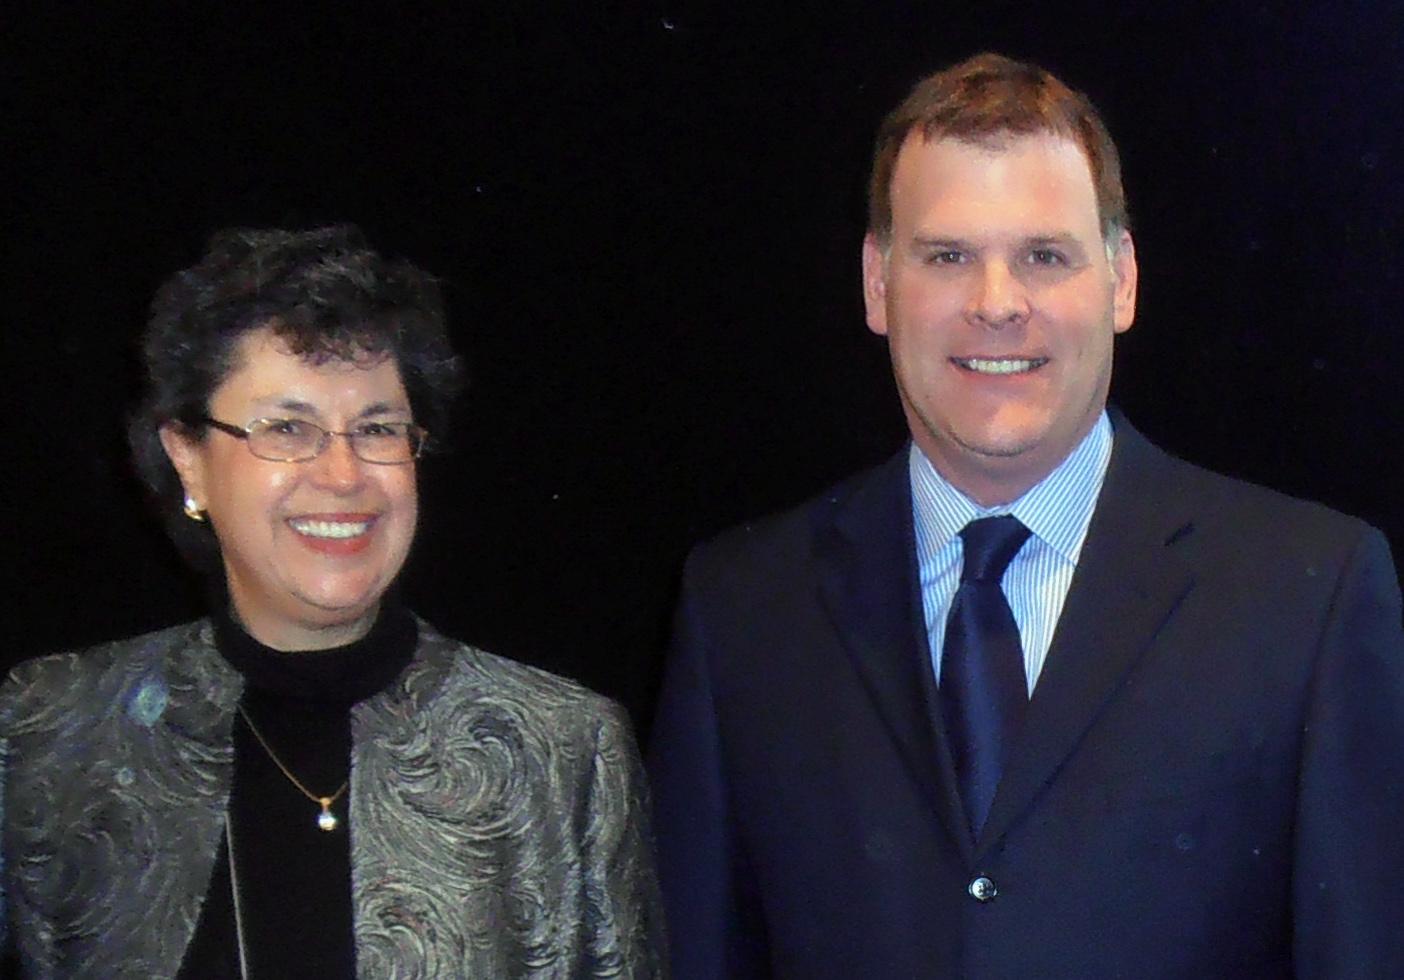 Joanne Charlebois, CASLPA's Executive Director, poses alongside the Hon. John Baird, Minsiter of Foreign Affairs